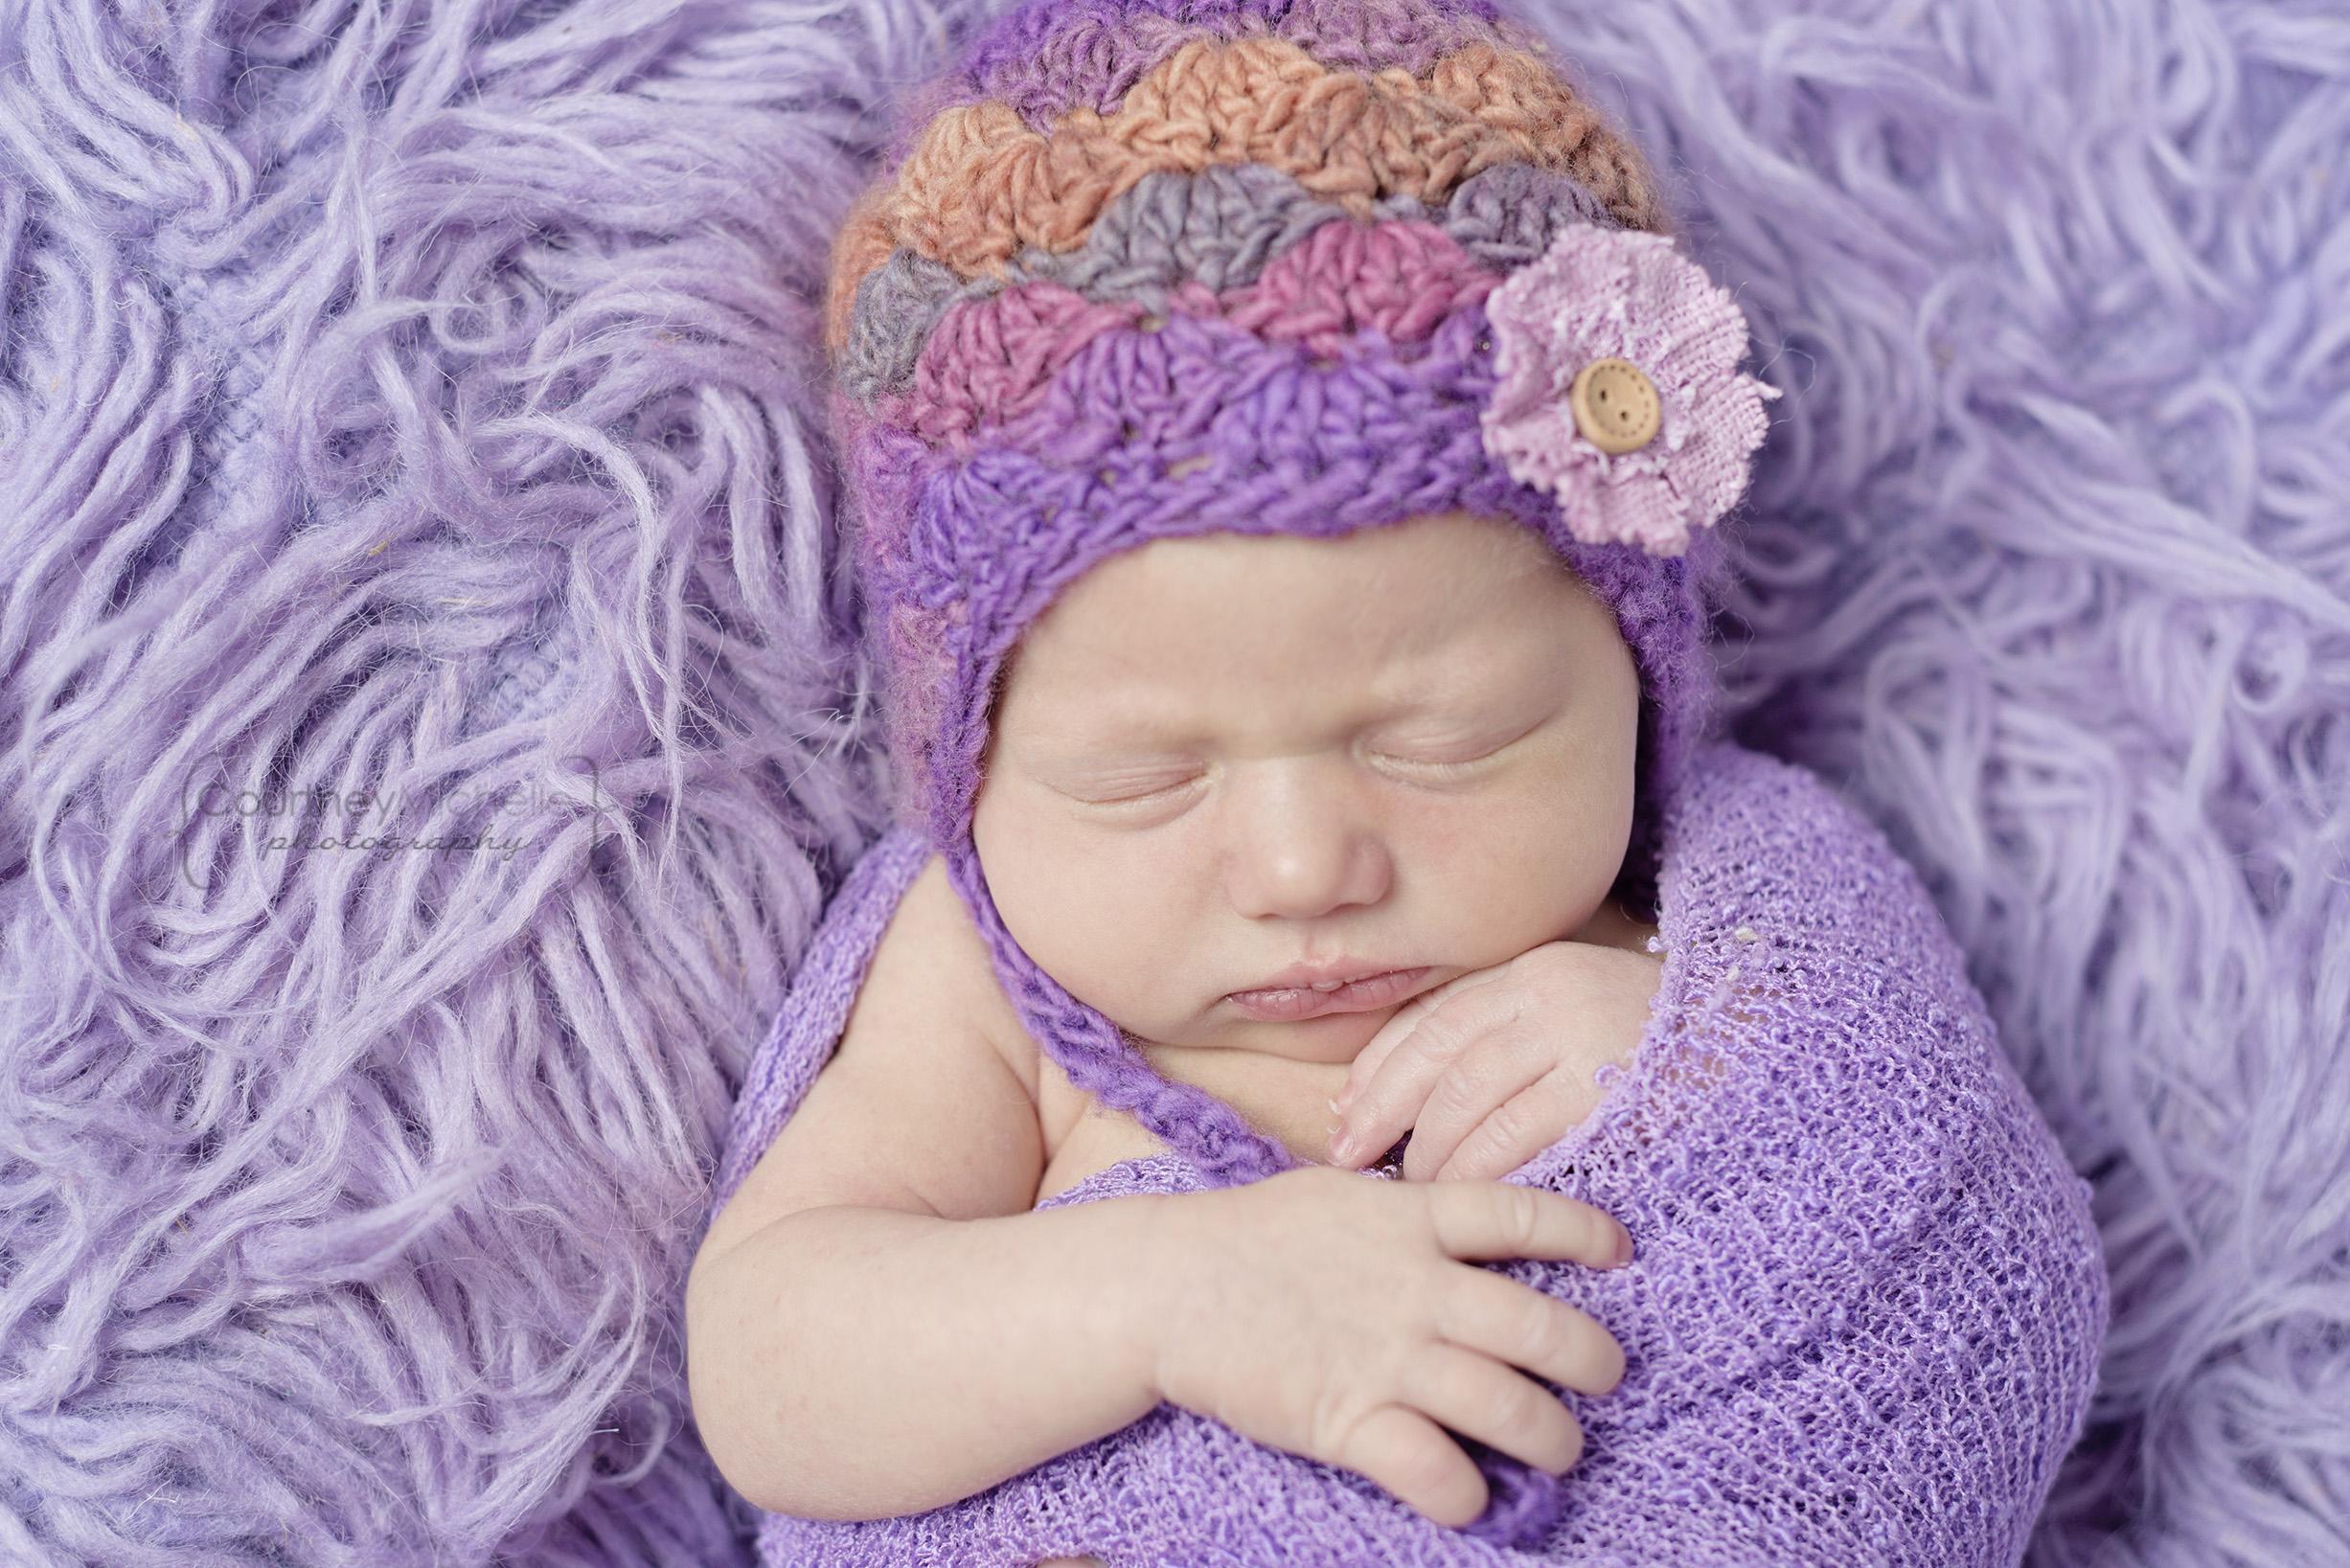 chicago-newborn-photographer©COPYRIGHTCMP-5187edit.jpg